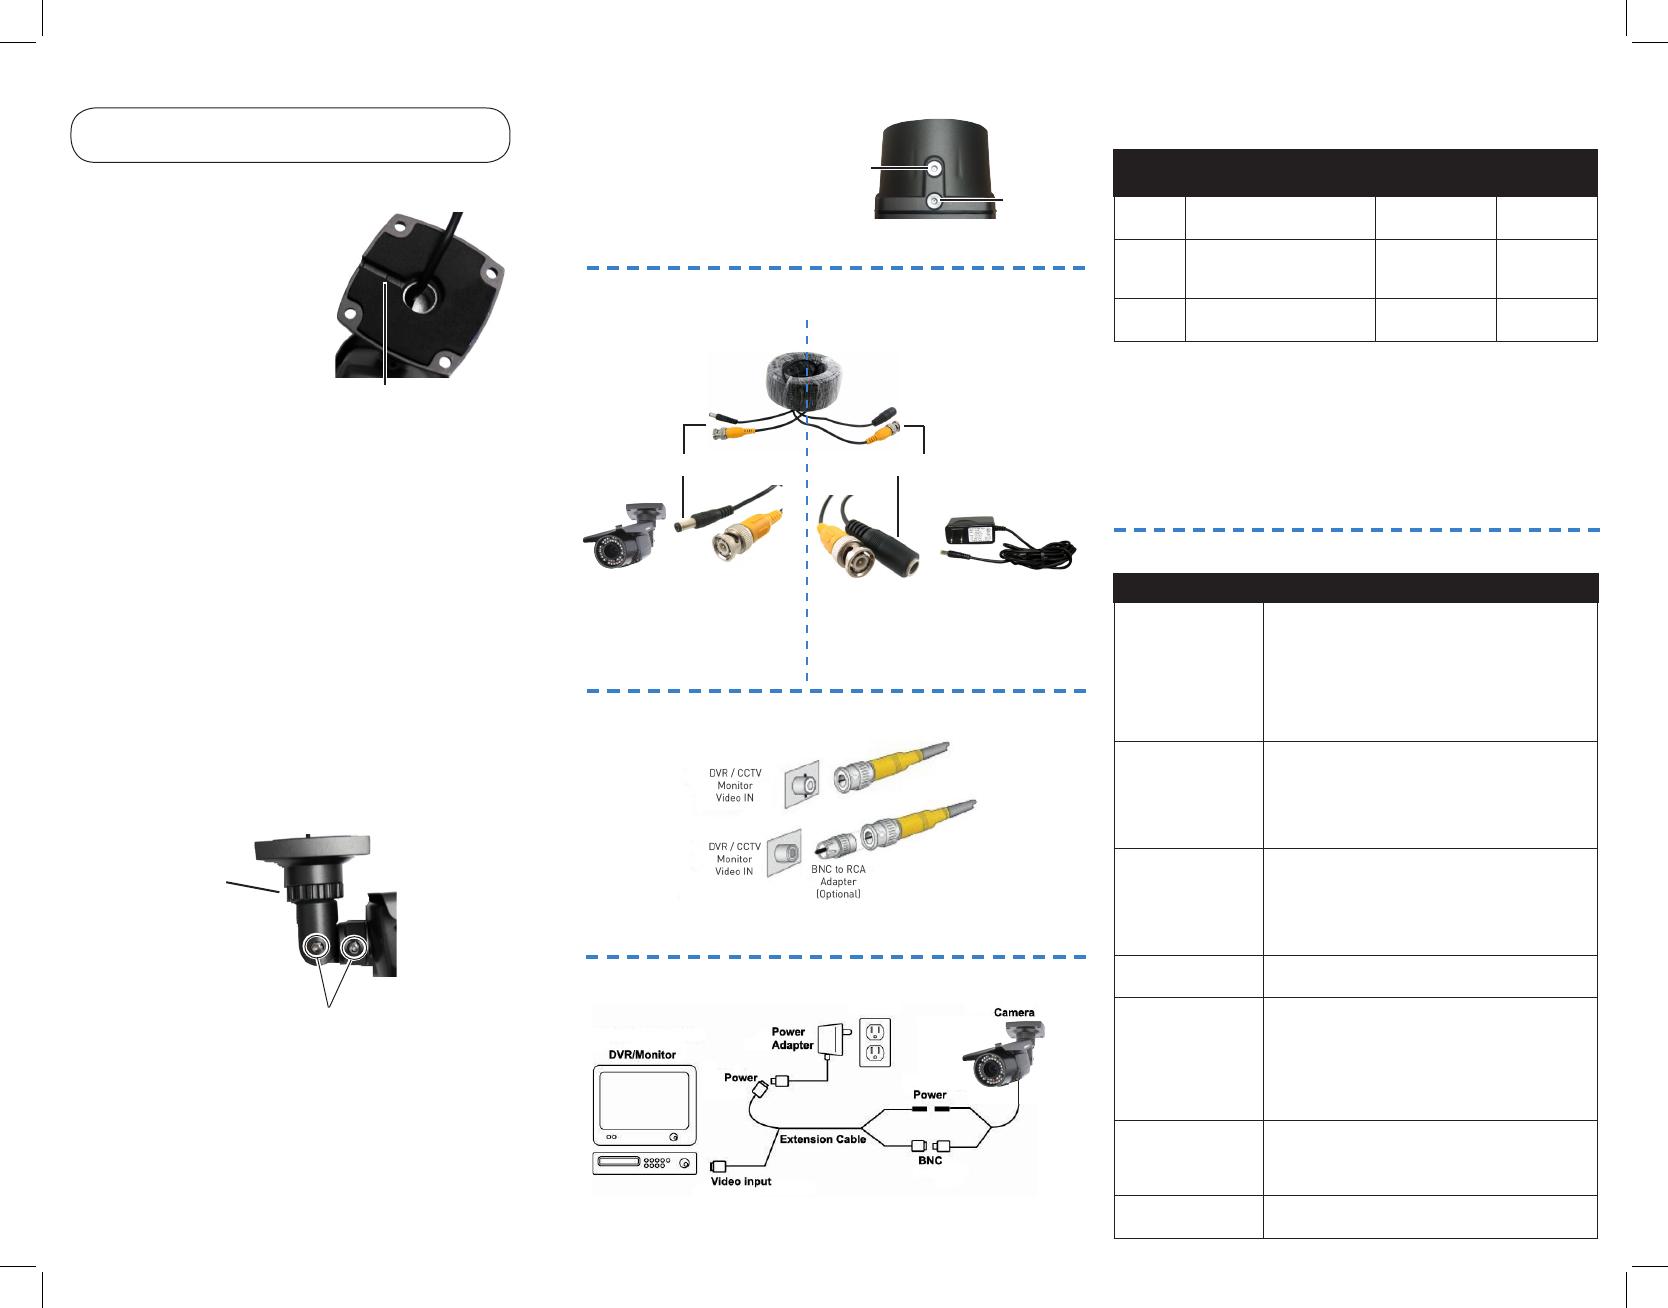 Swann Security Camera N3960 Wiring Diagram - Wiring Solutions